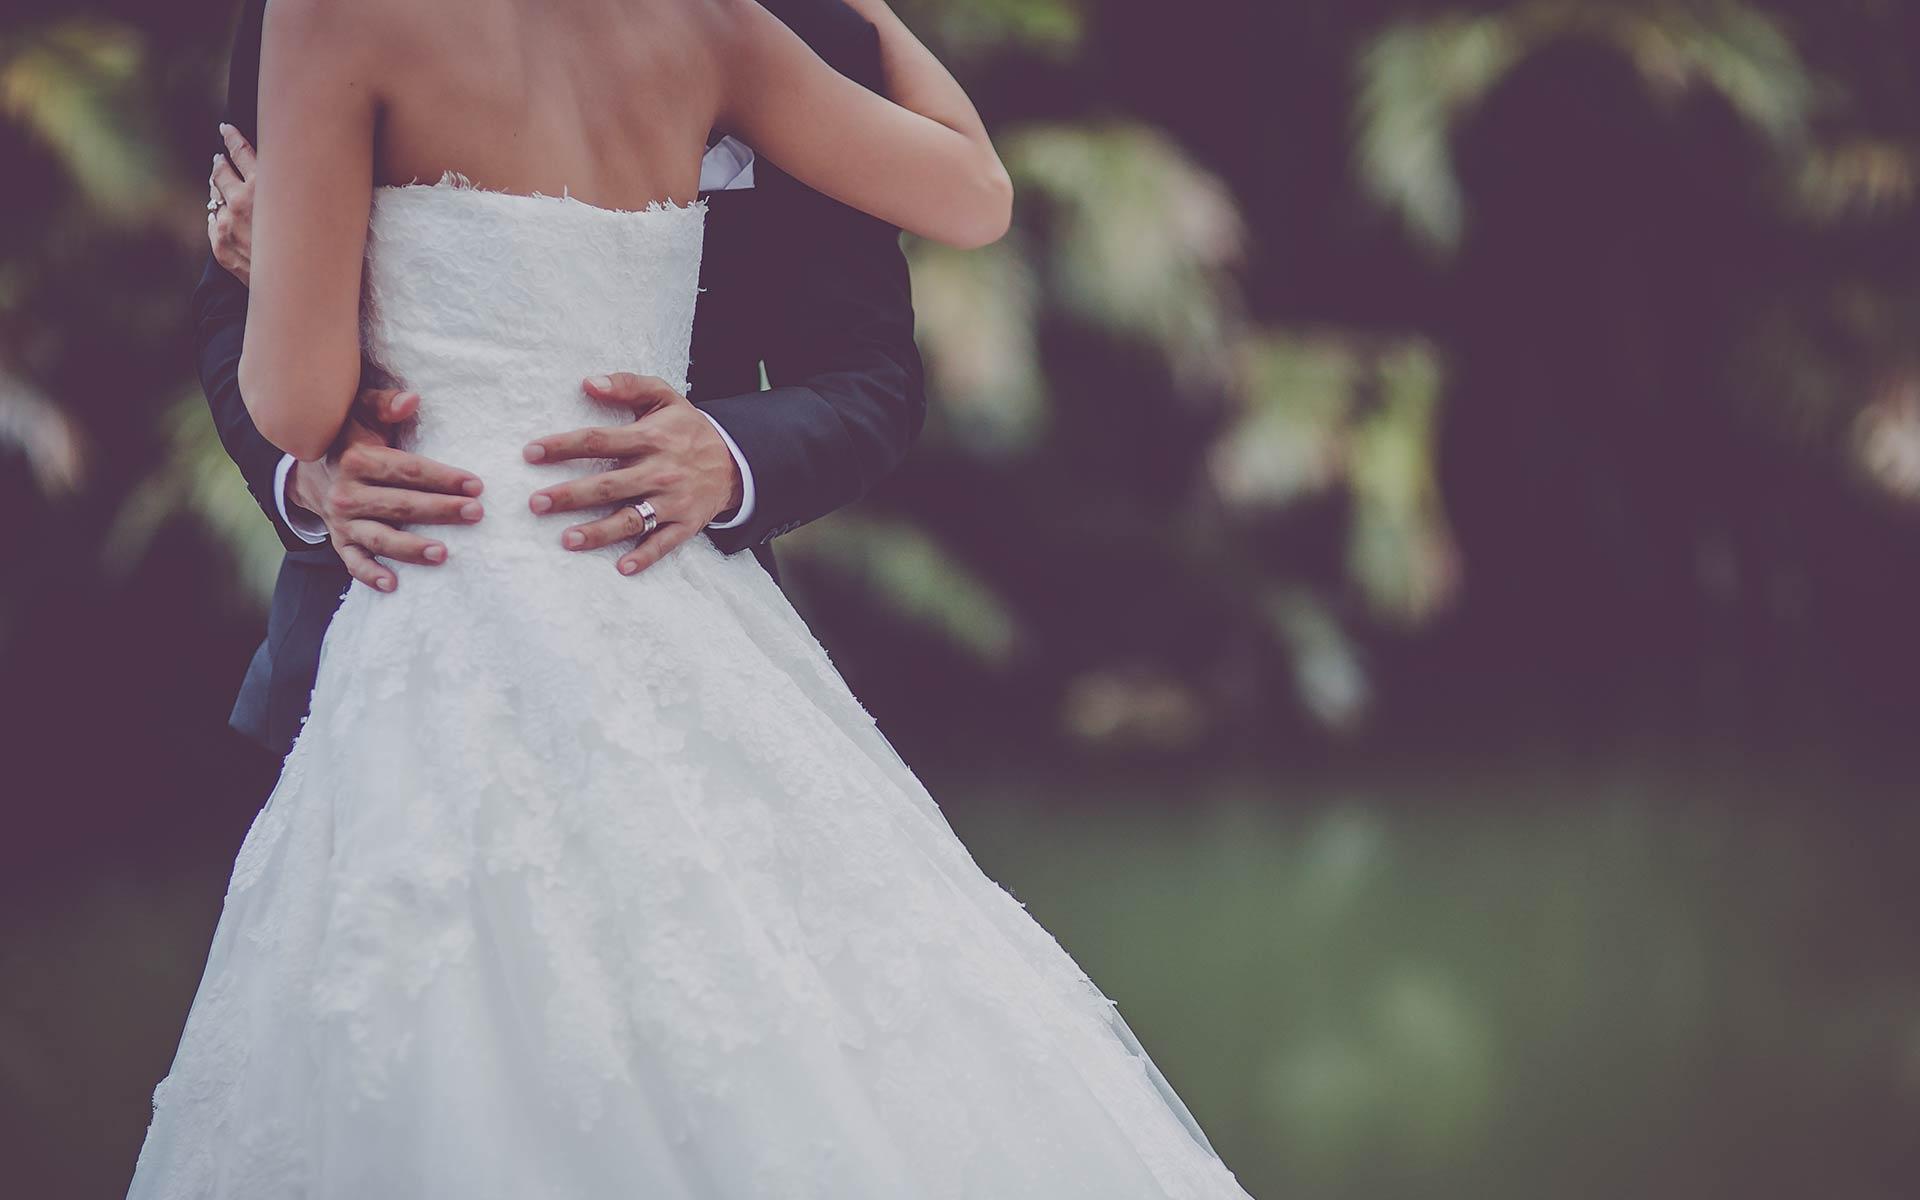 Us caseu?